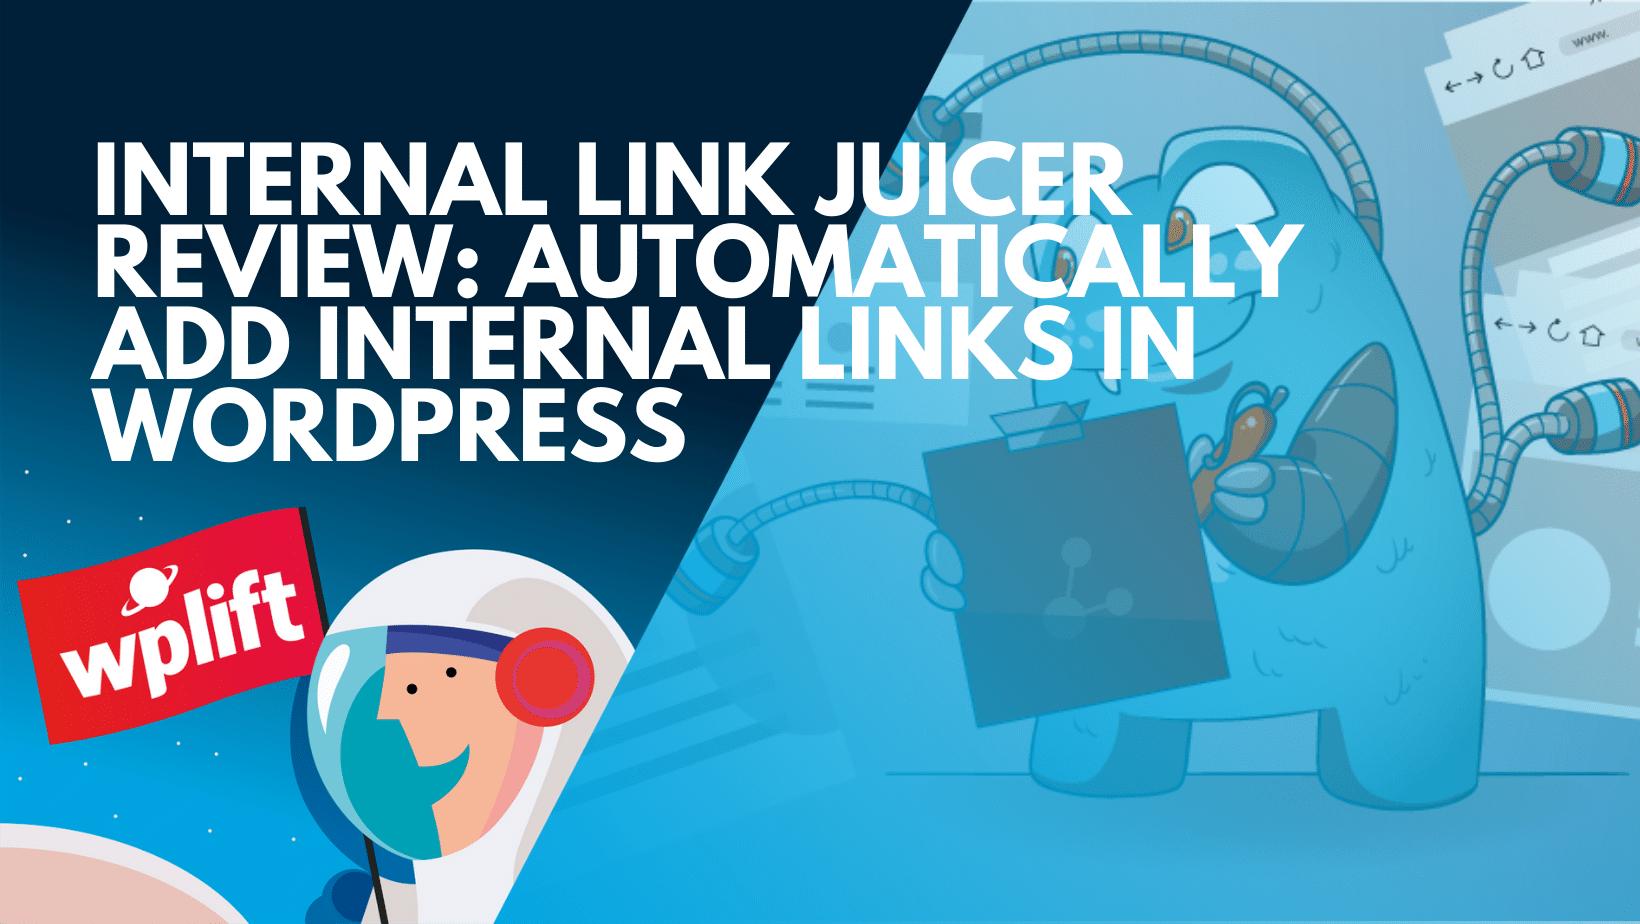 Automatically Add Internal Links in WordPress